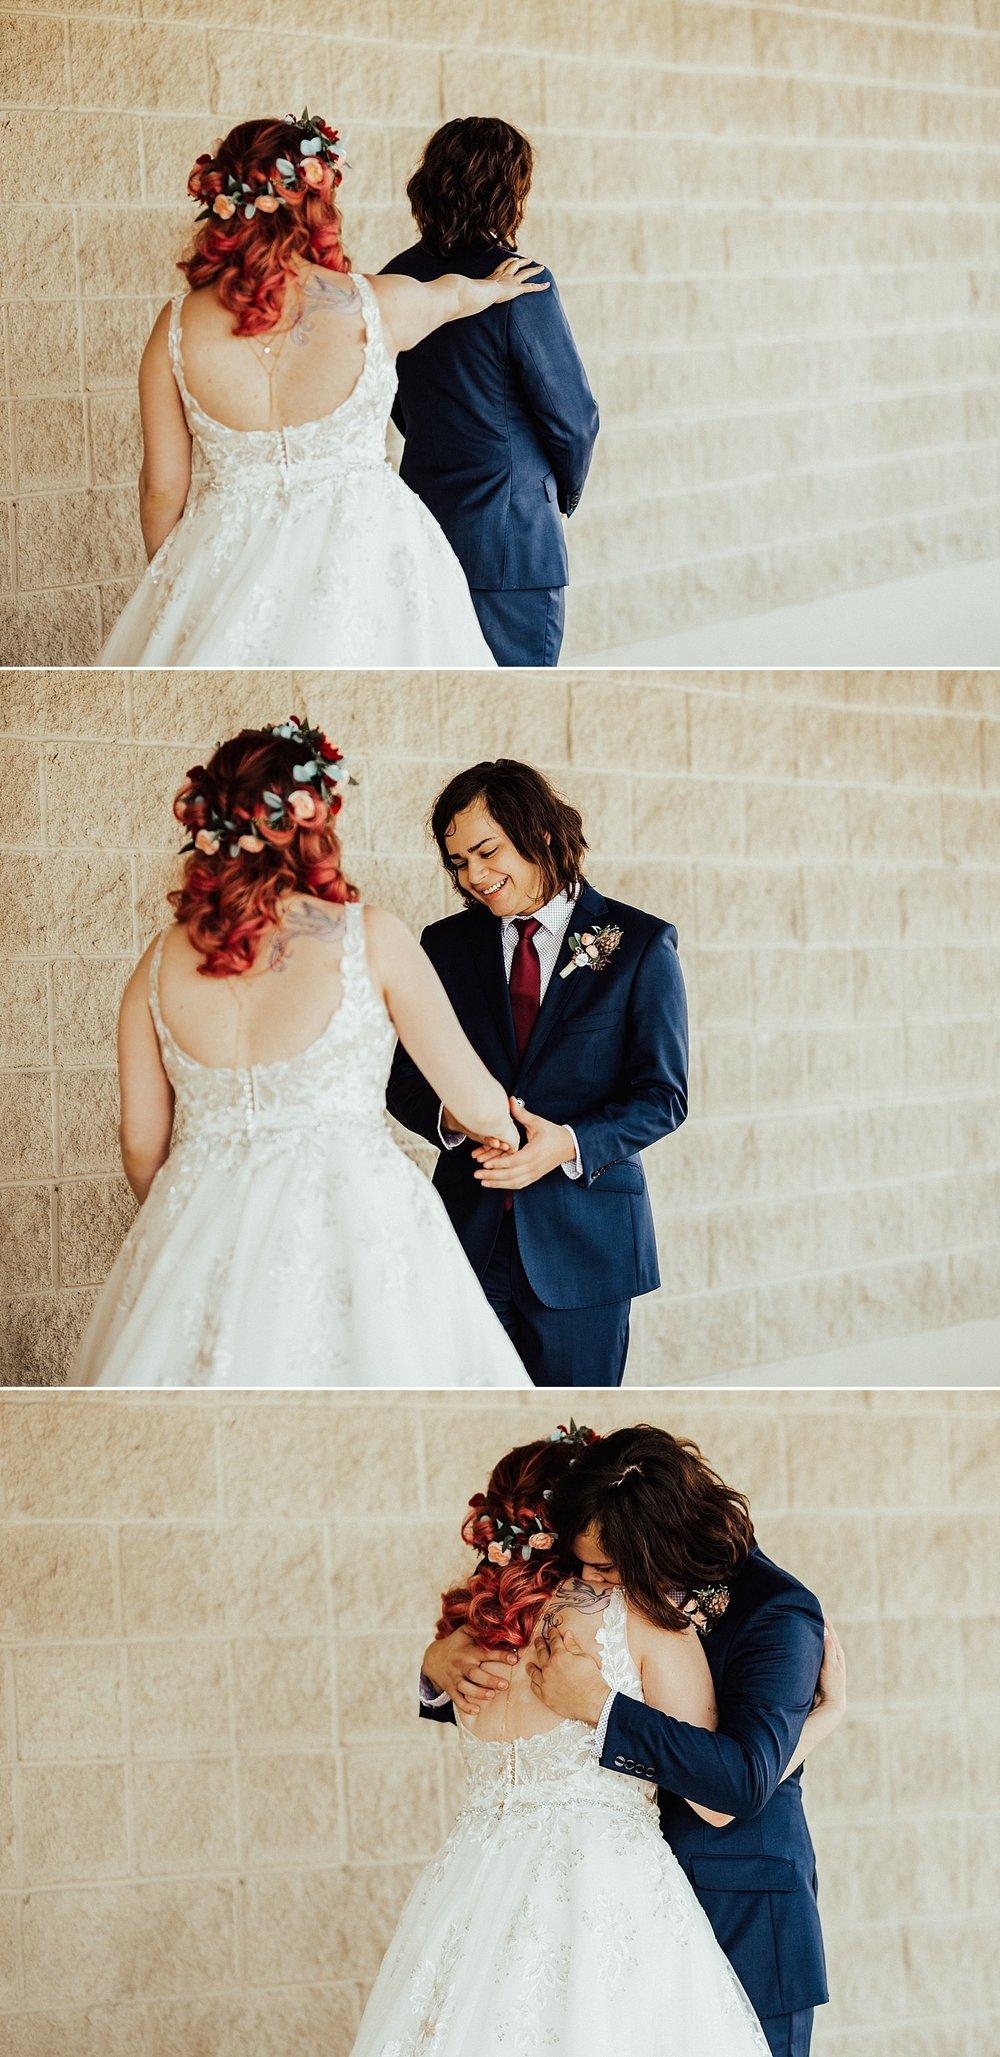 rock-and-roll-dark-romantic-wedding-37.jpg